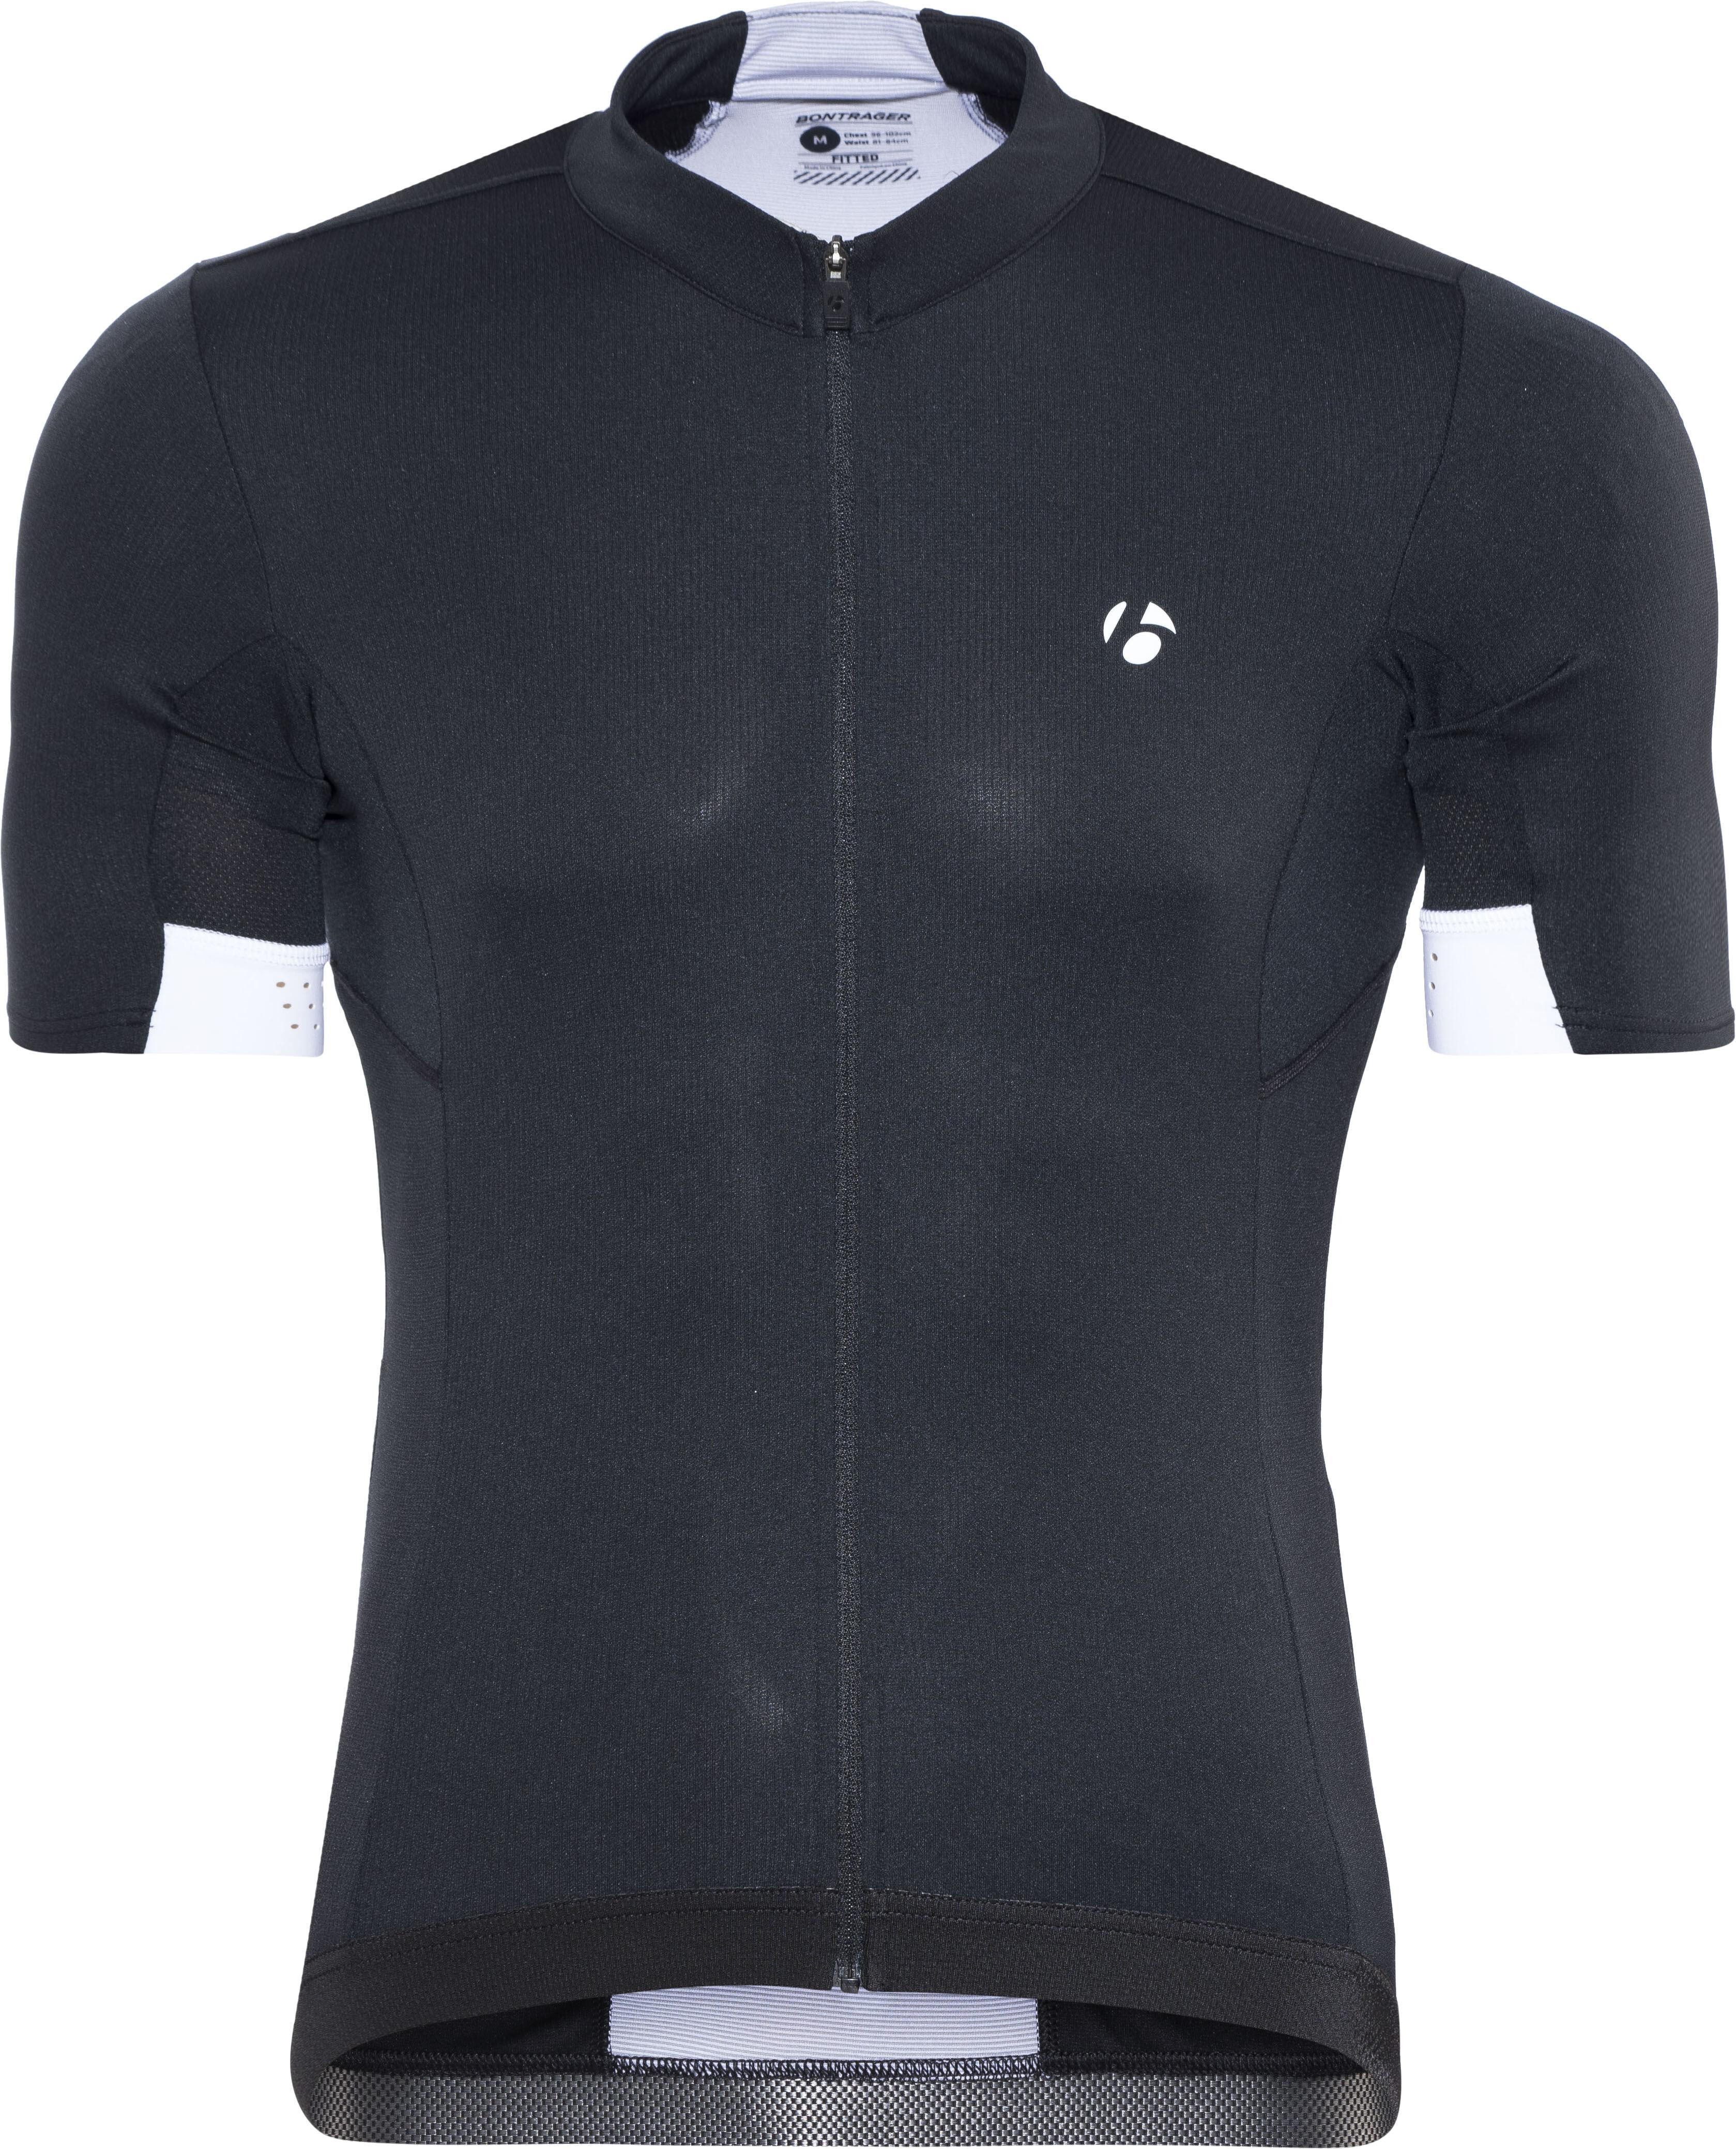 ba10cc68 Bontrager Velocis Koszulka kolarska, krótki rękaw Mężczyźni, black